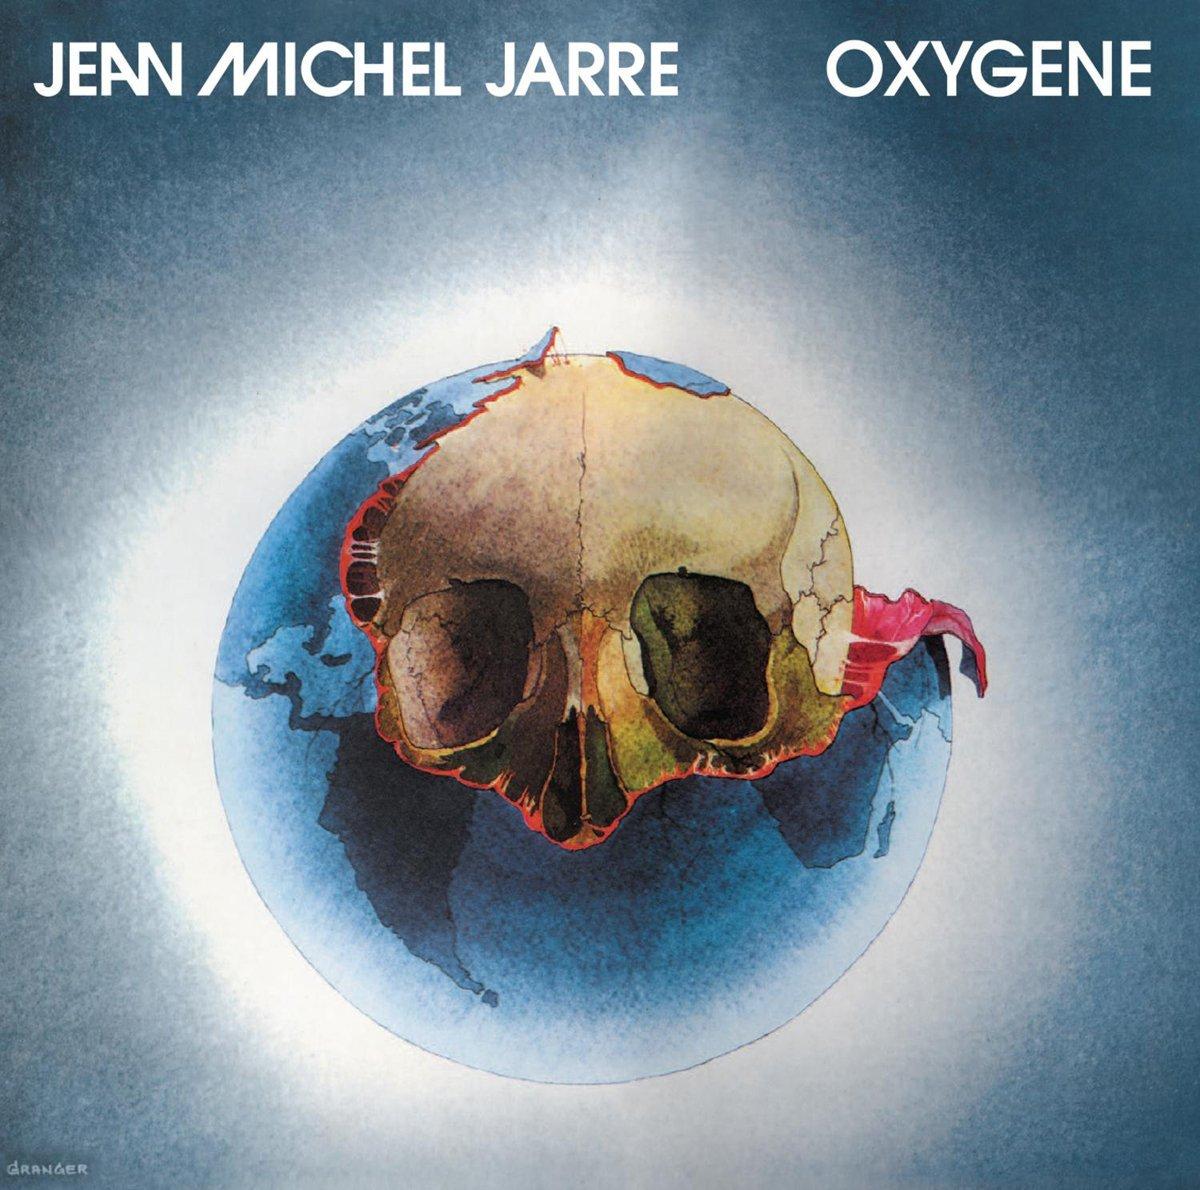 Copertina Disco Vinile 33 giri Oxygene di Jean Michel Jarre